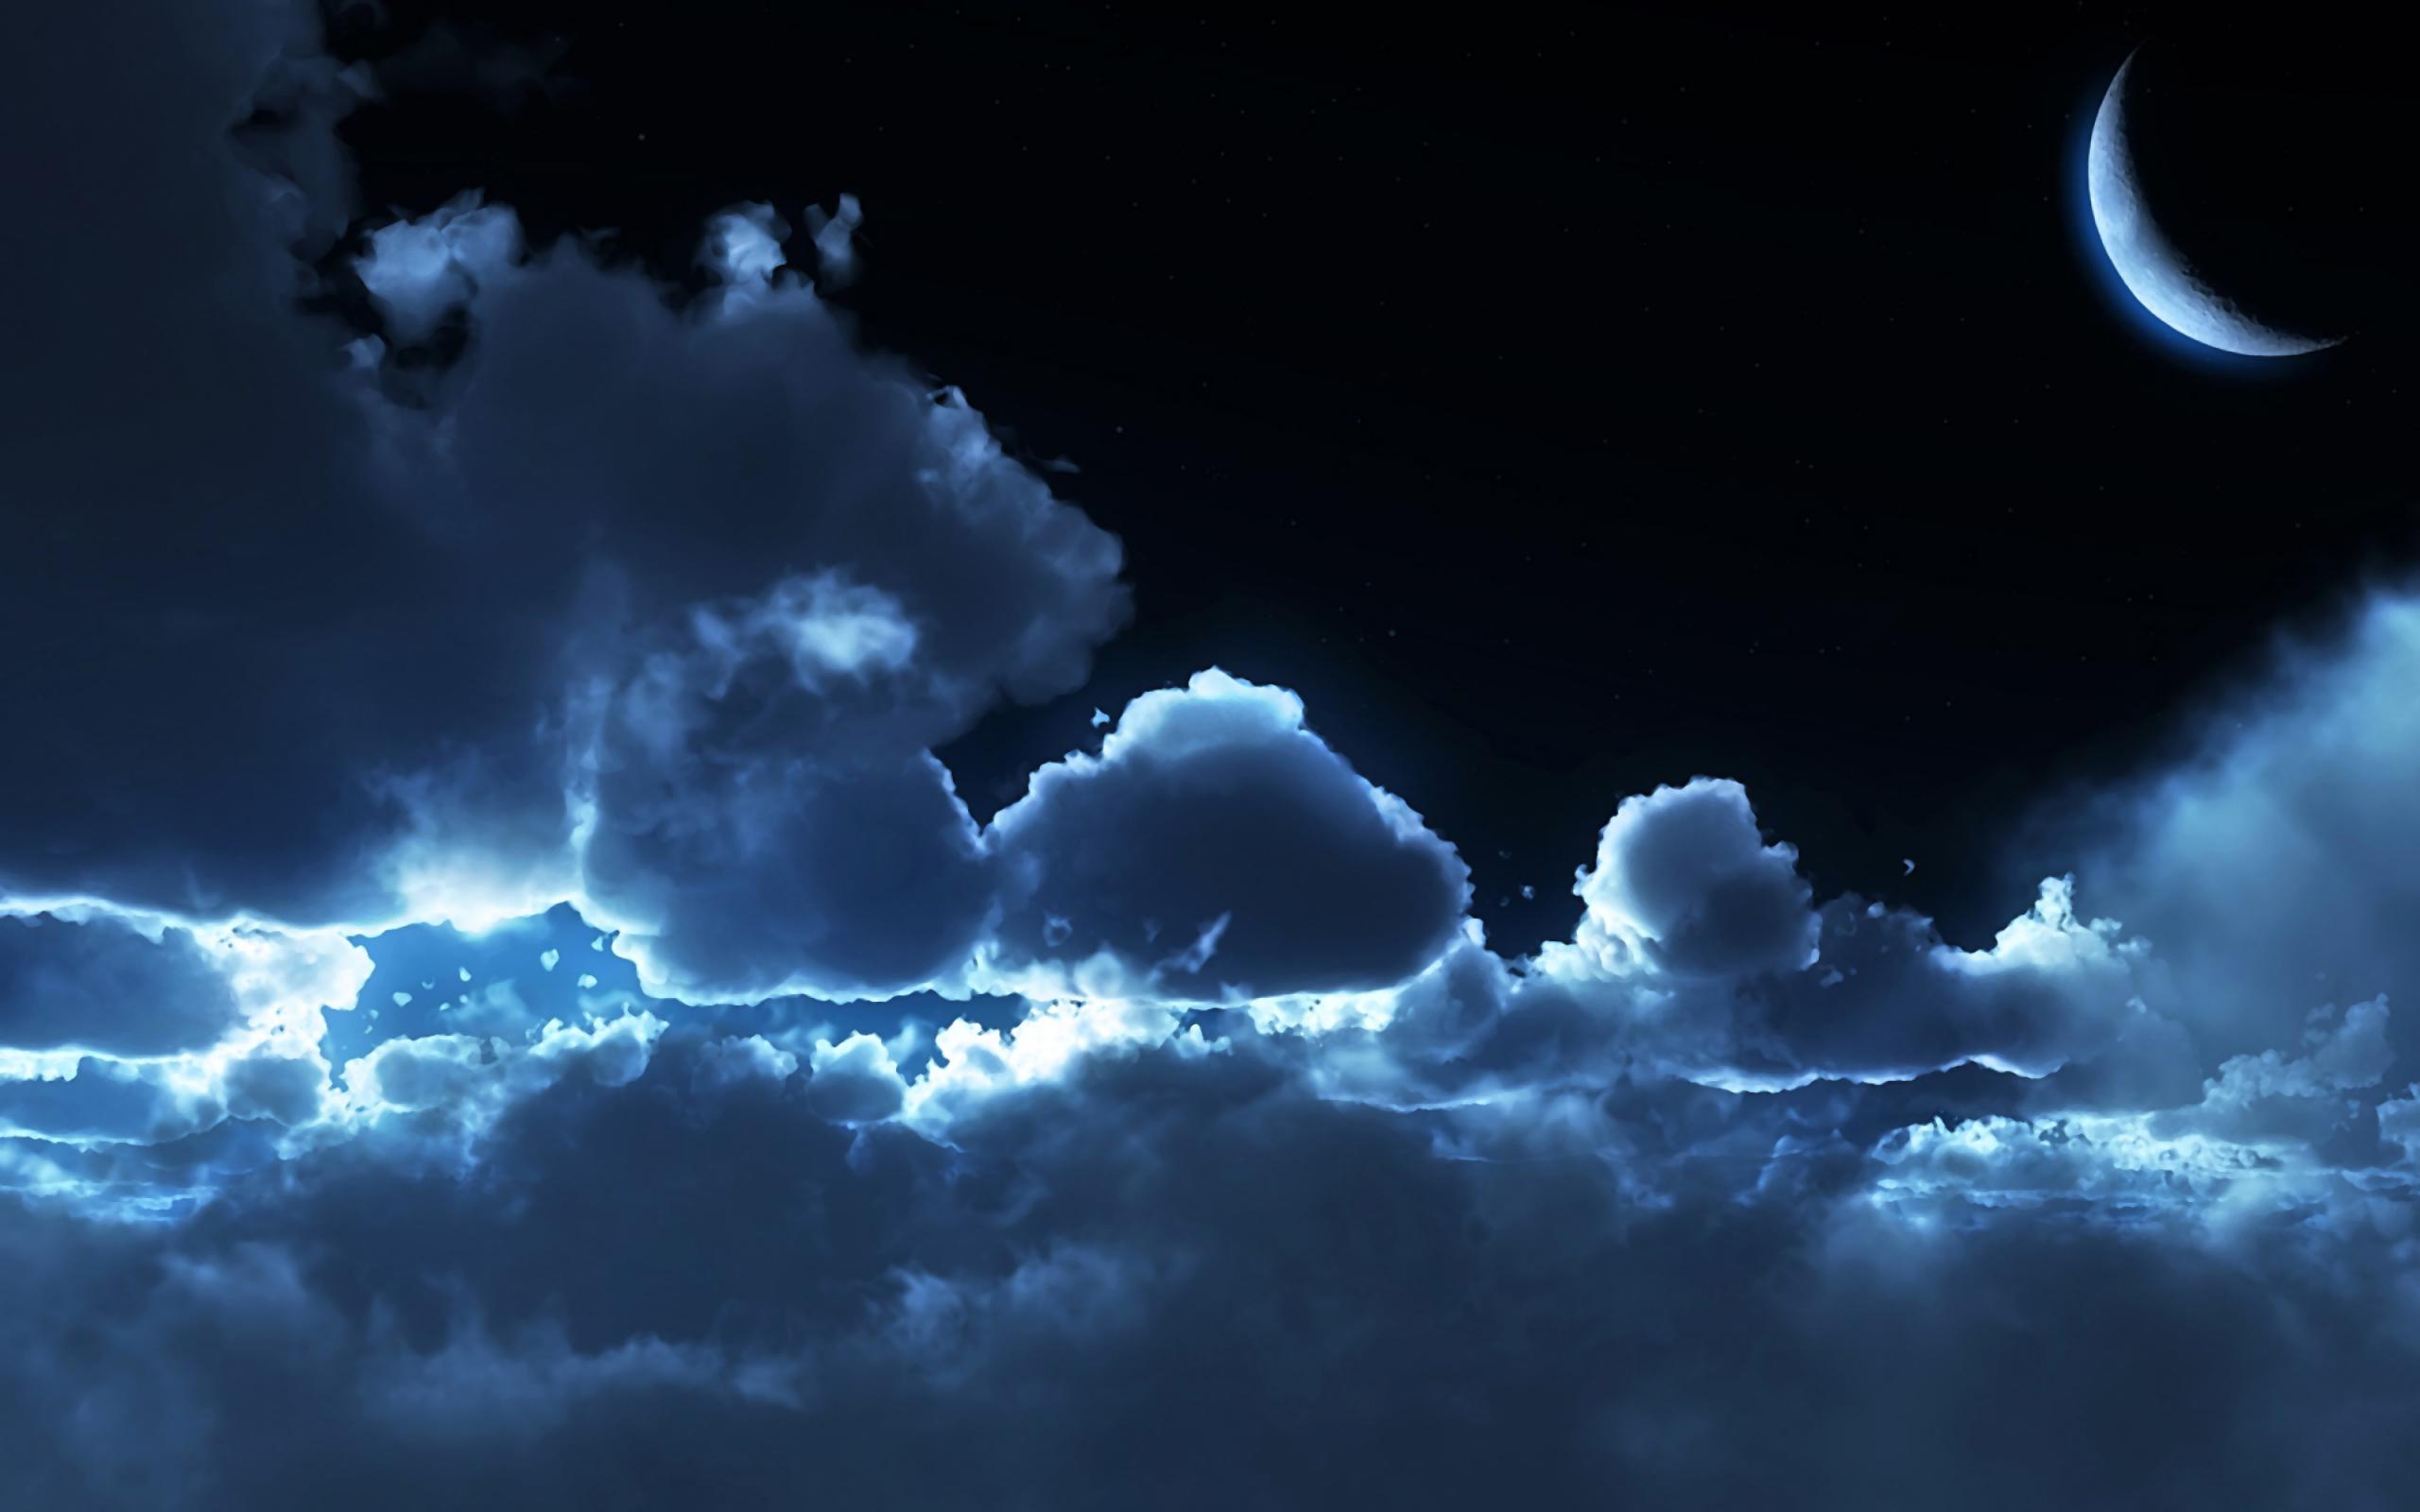 night cloud wallpaper hd | pixelstalk